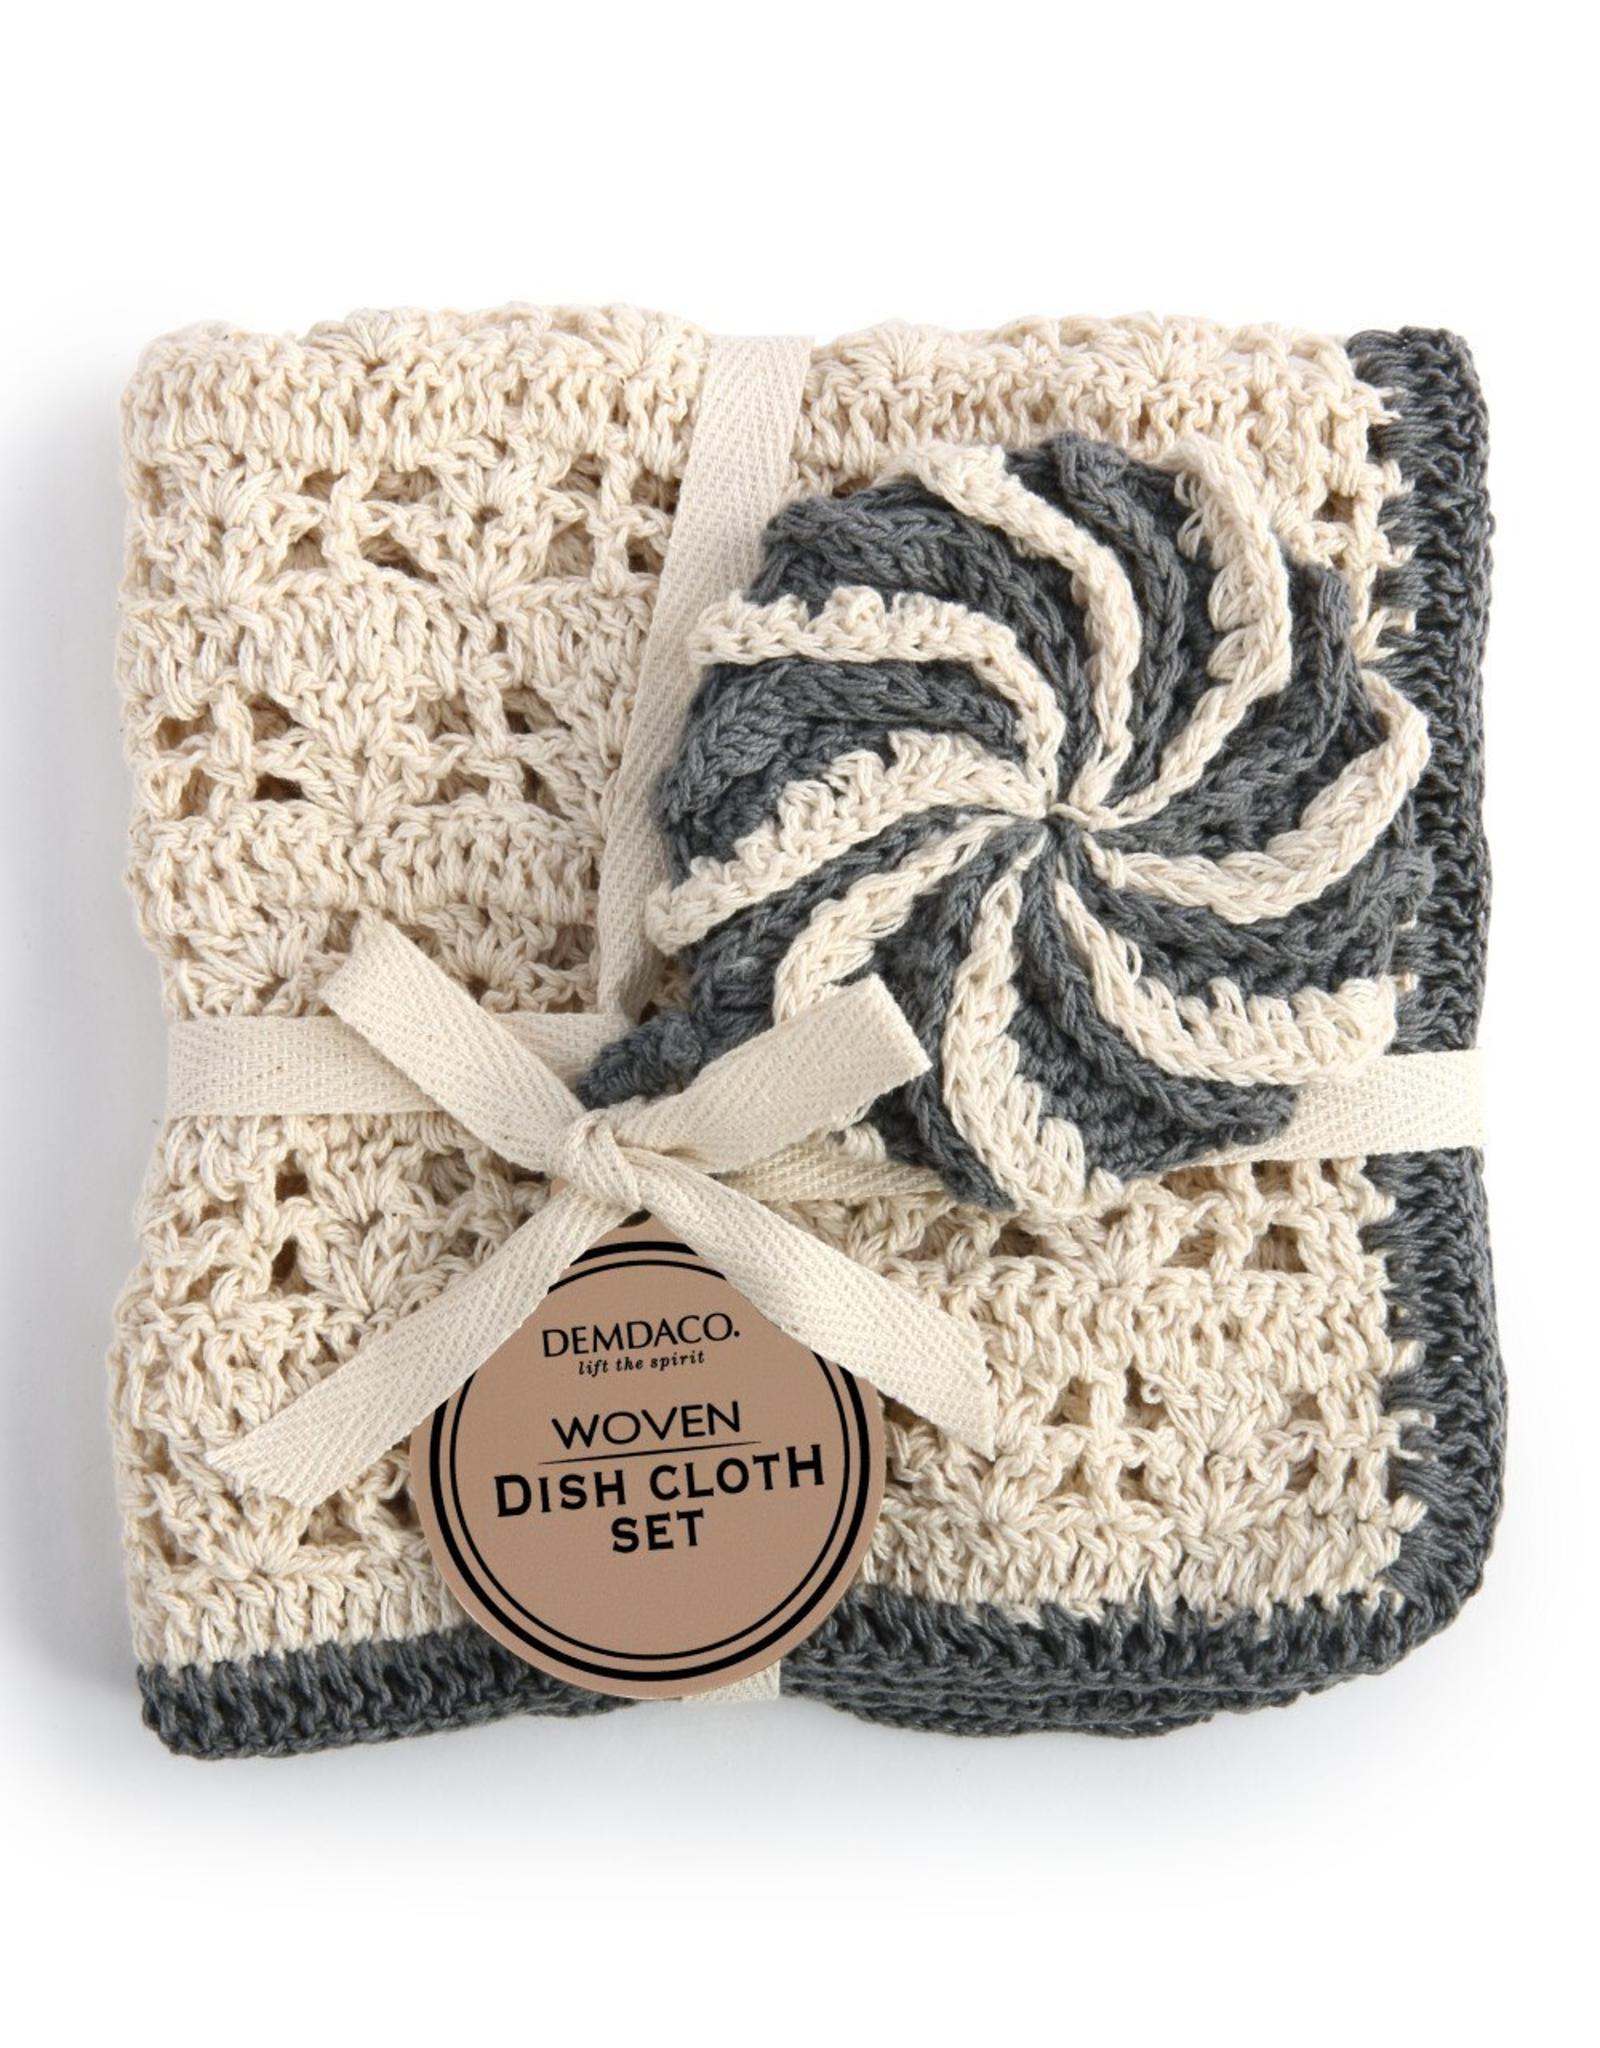 Black Woven Dish Cloth Set